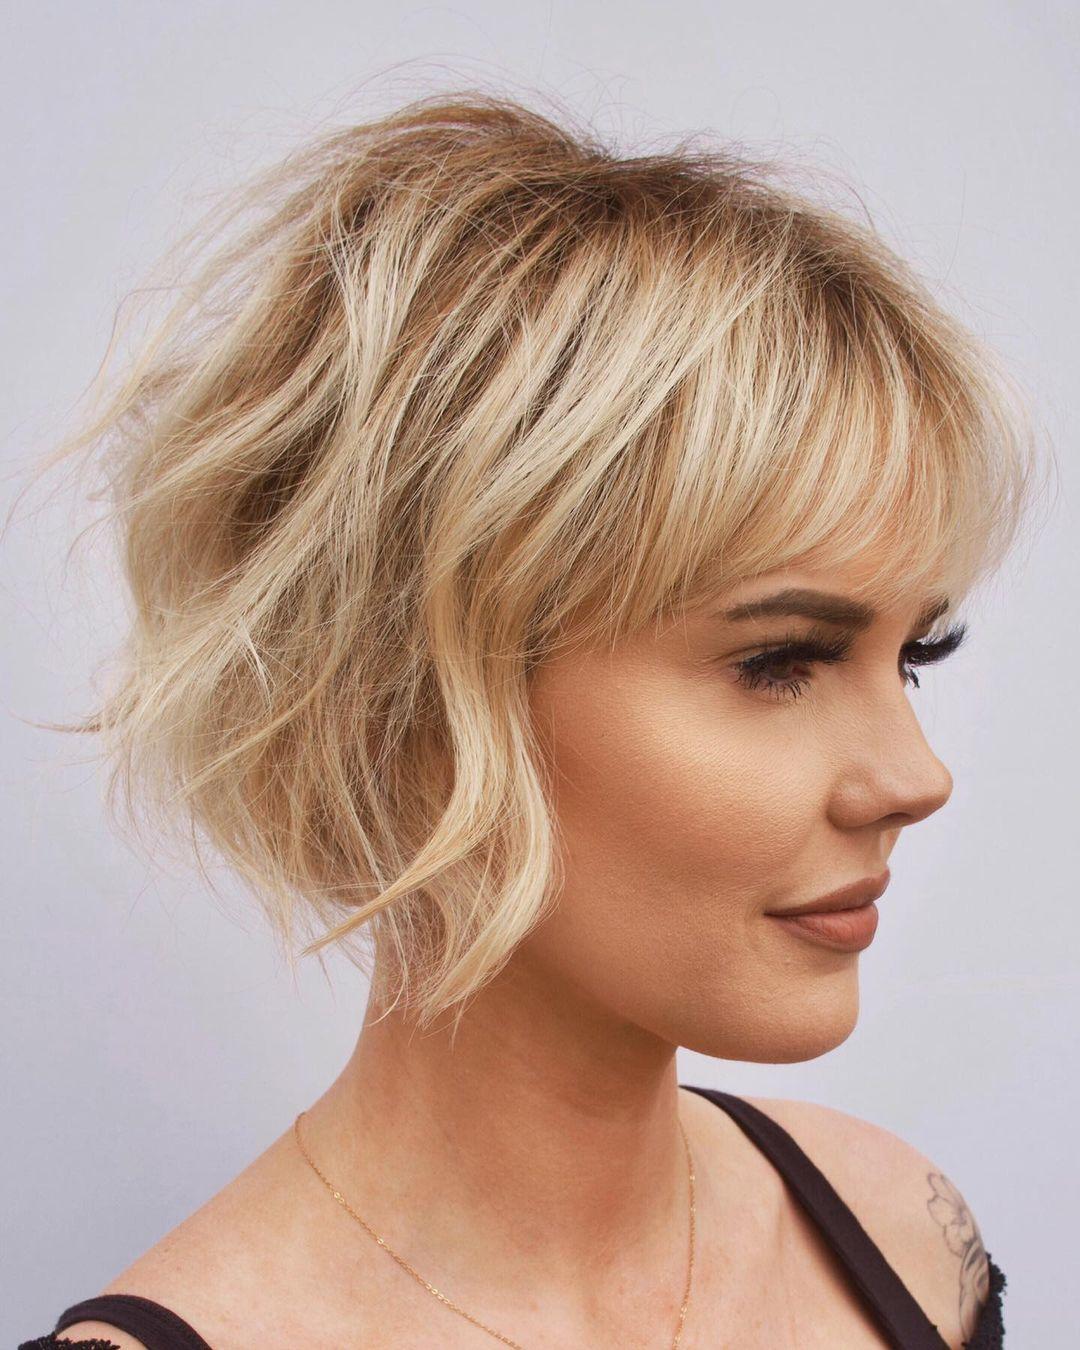 Short Fine Hair with Bangs